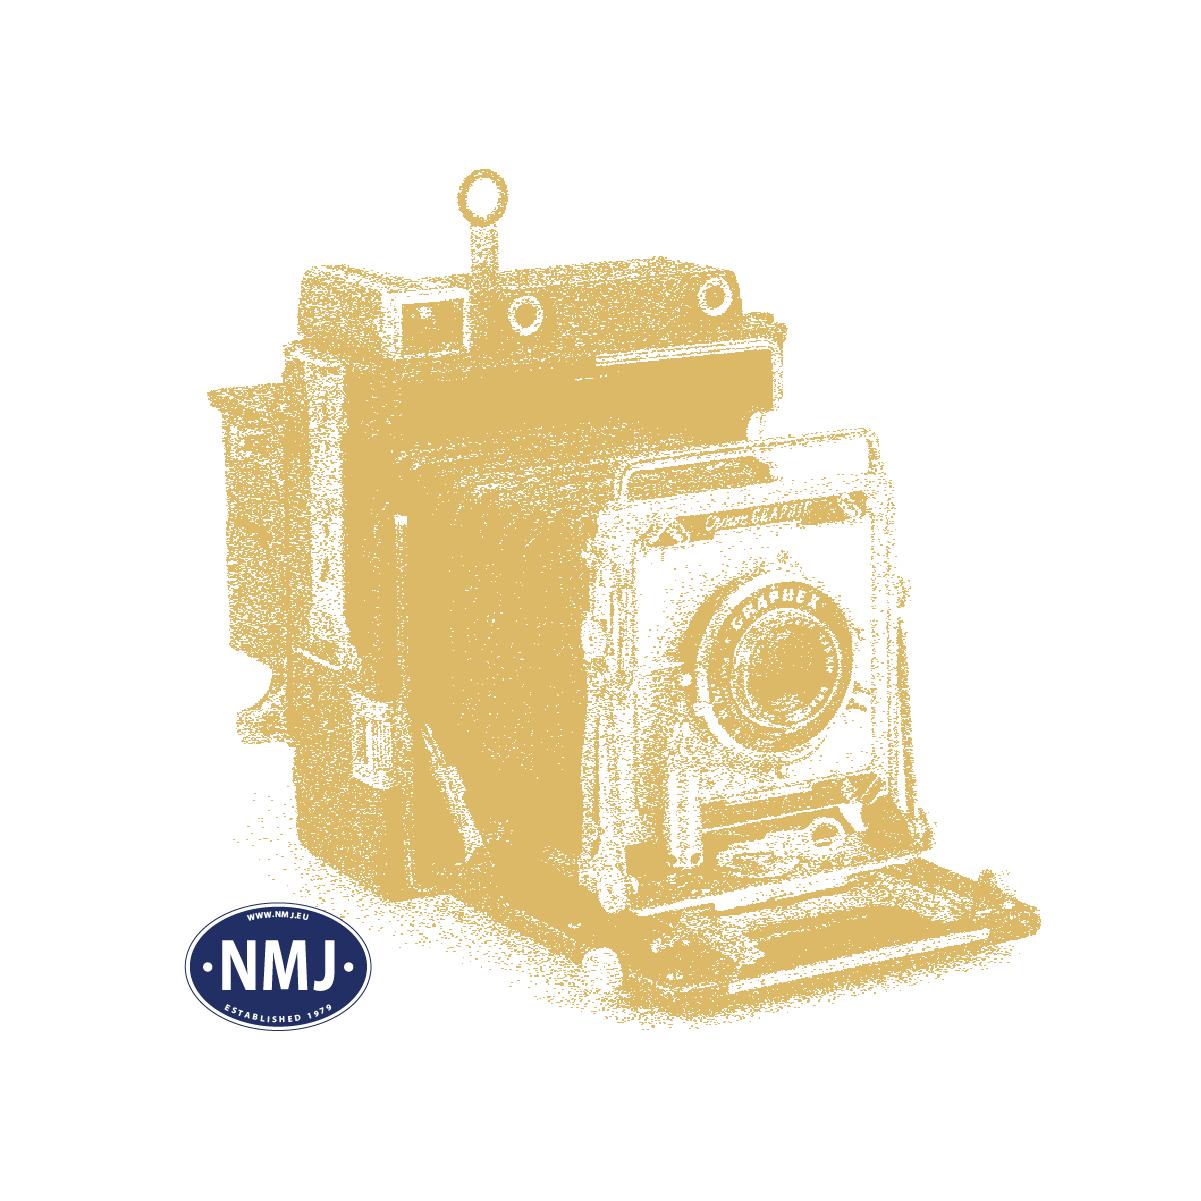 NMJT85.202 - NMJ Topline CargoNet Di8.707, DCC Digital mit Sound